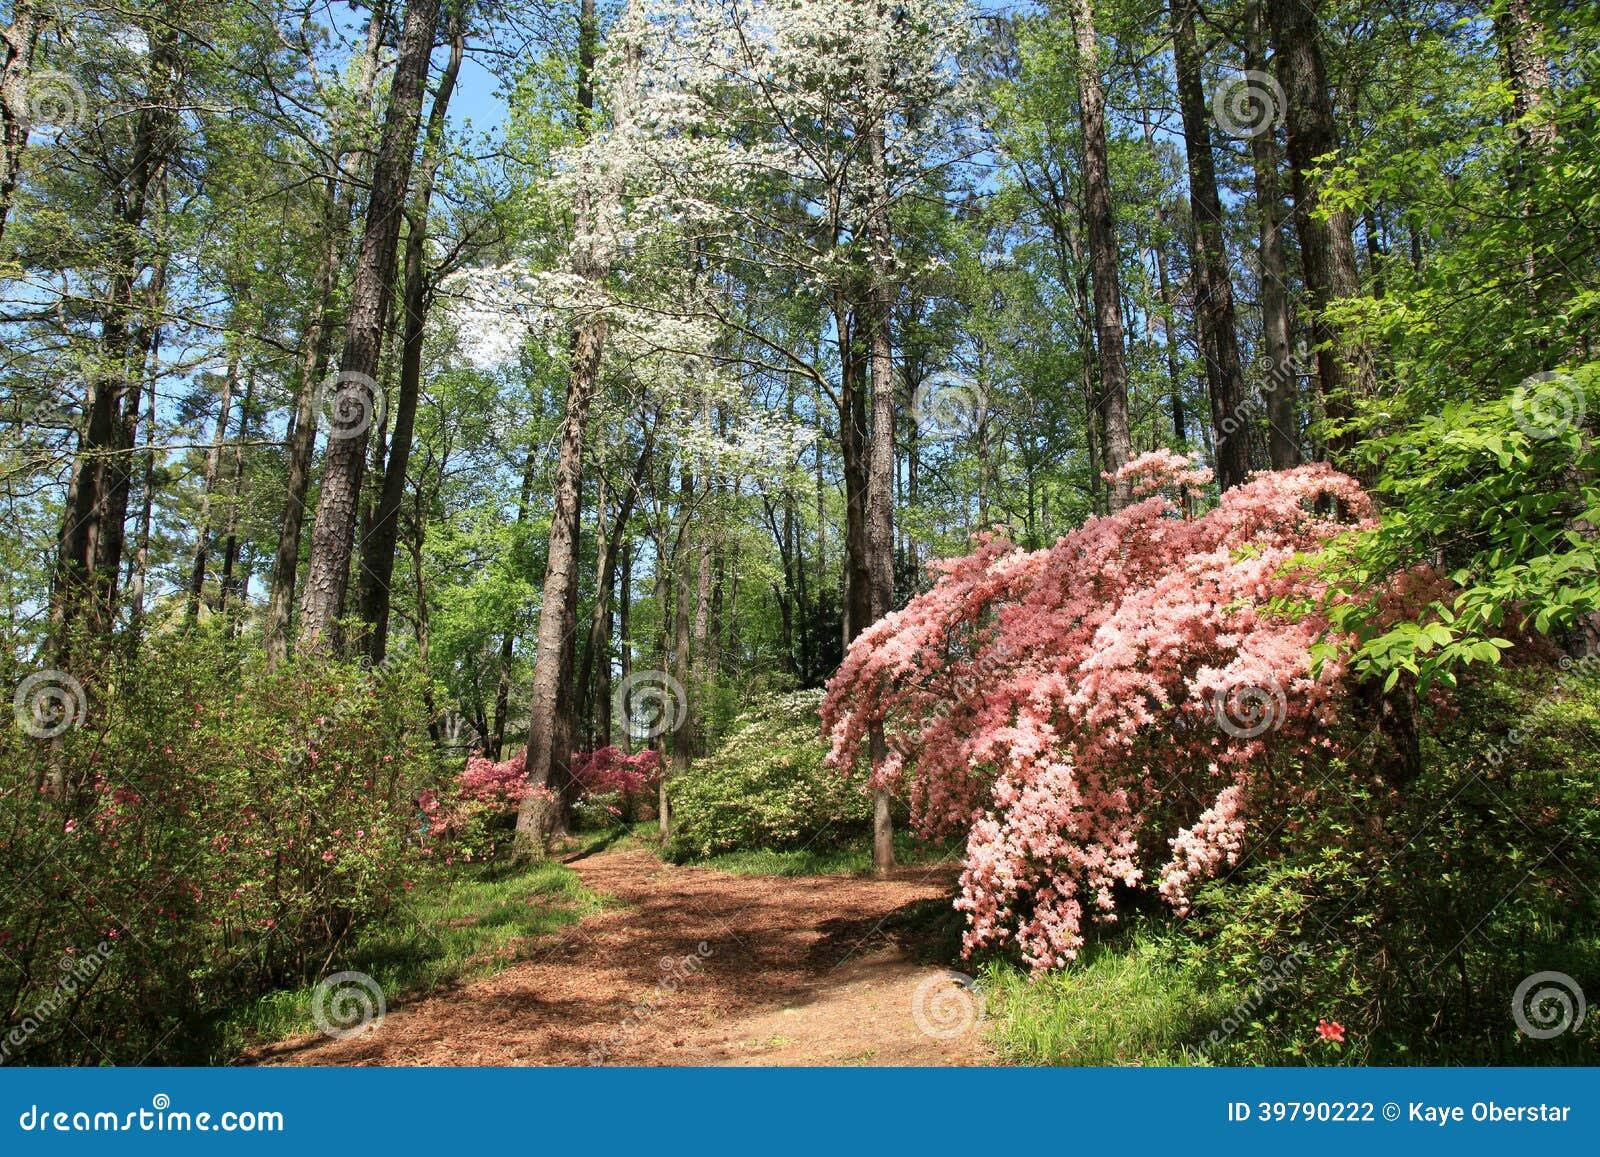 Azaleas At Callaway Gardens Stock Photo Image 39790222